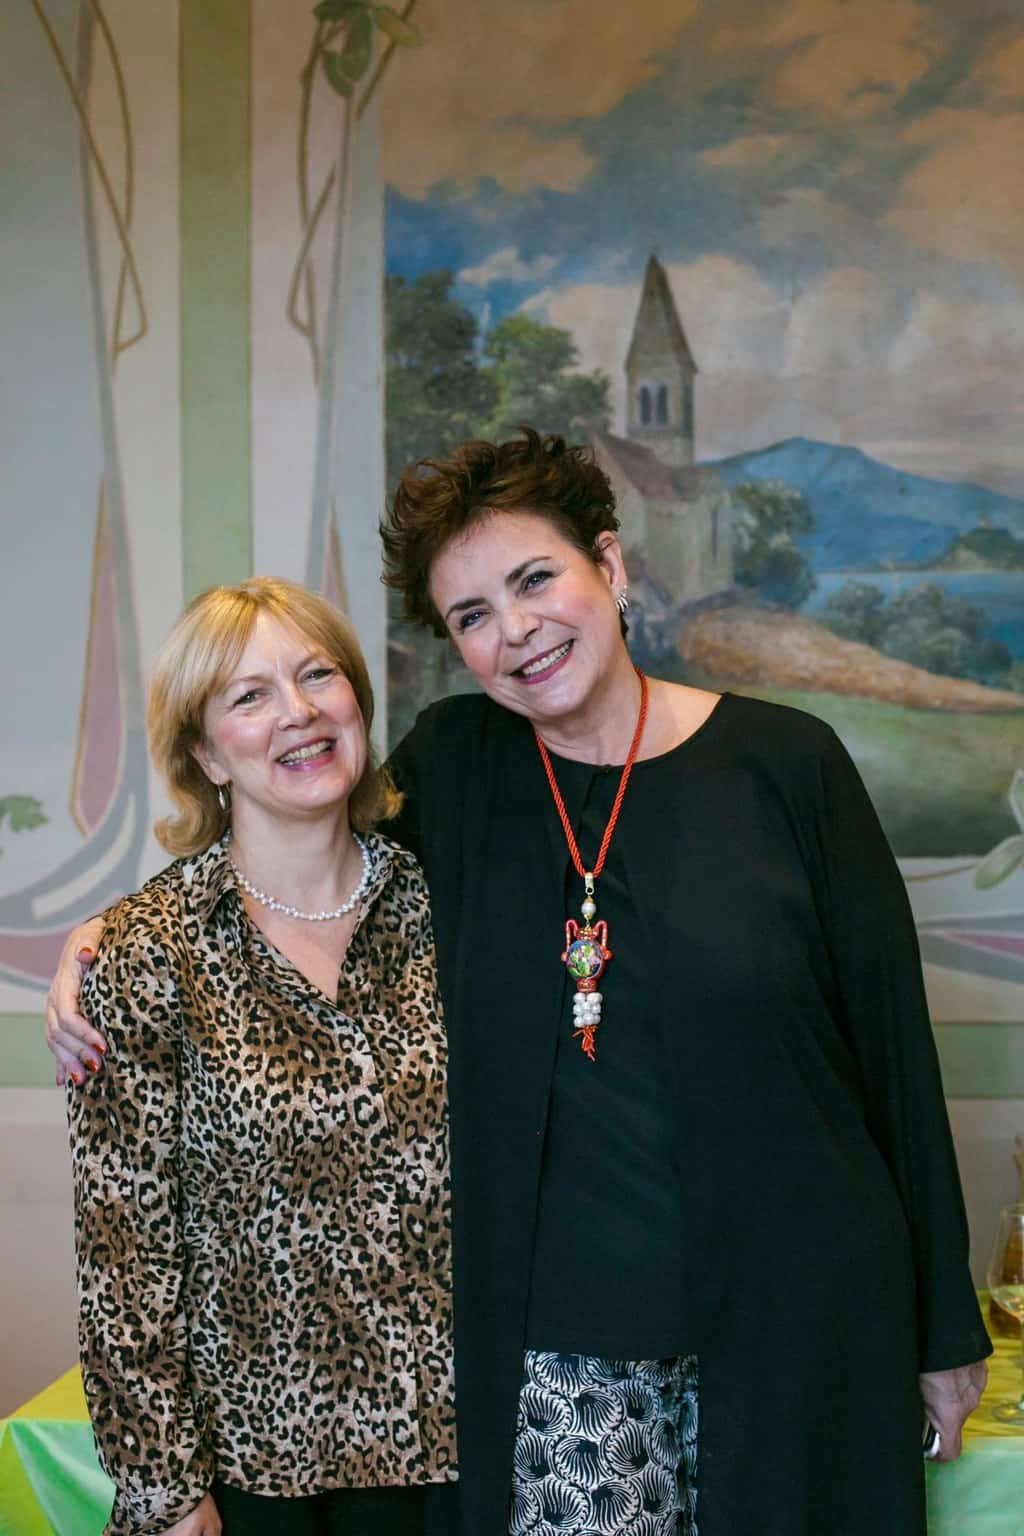 Cristina Rocco at Italian Allegriaat Villa Erlengut Erlenbach